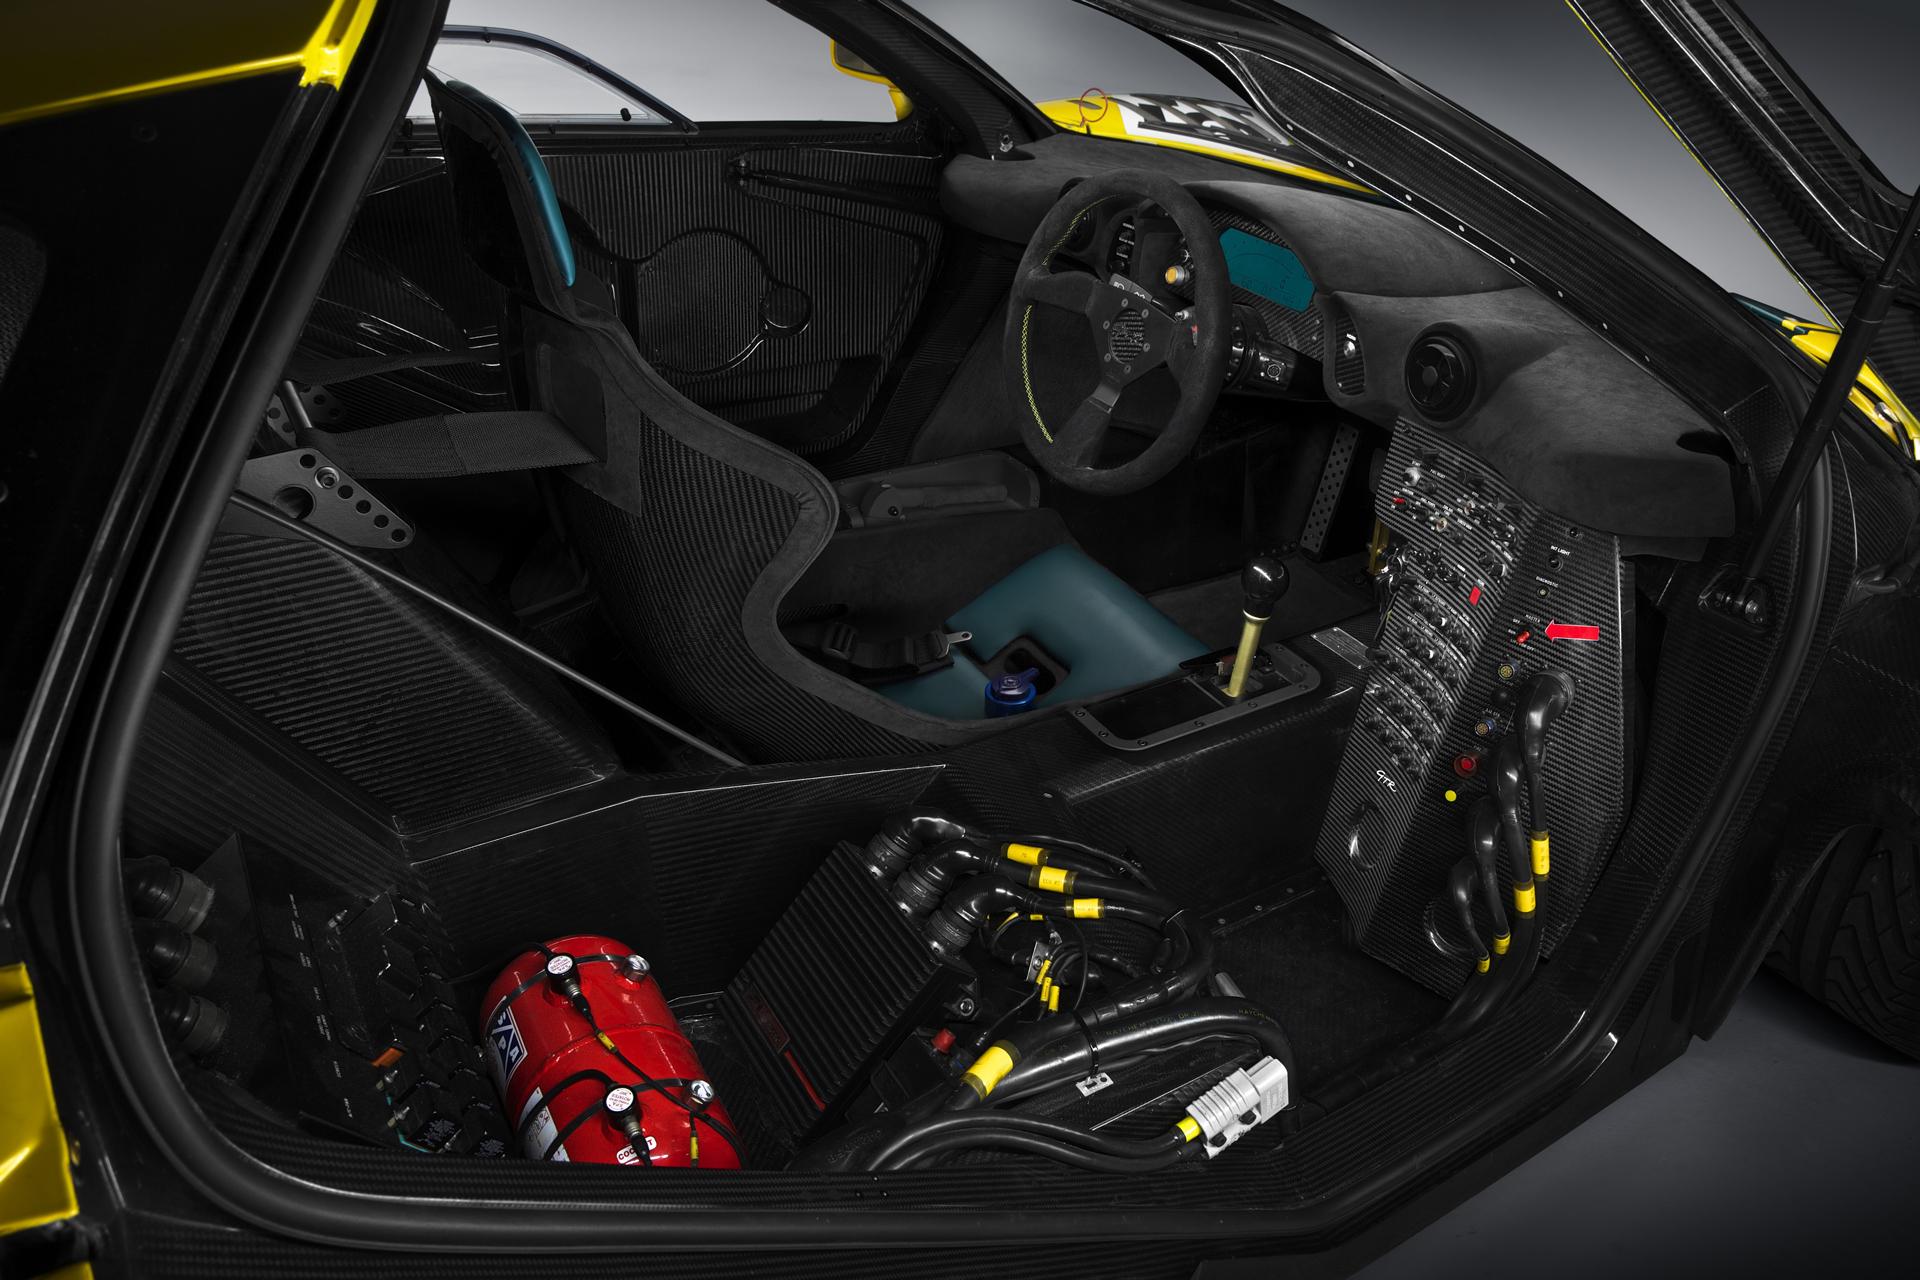 McLaren F1 GTR - 1995-2015 - intérieur